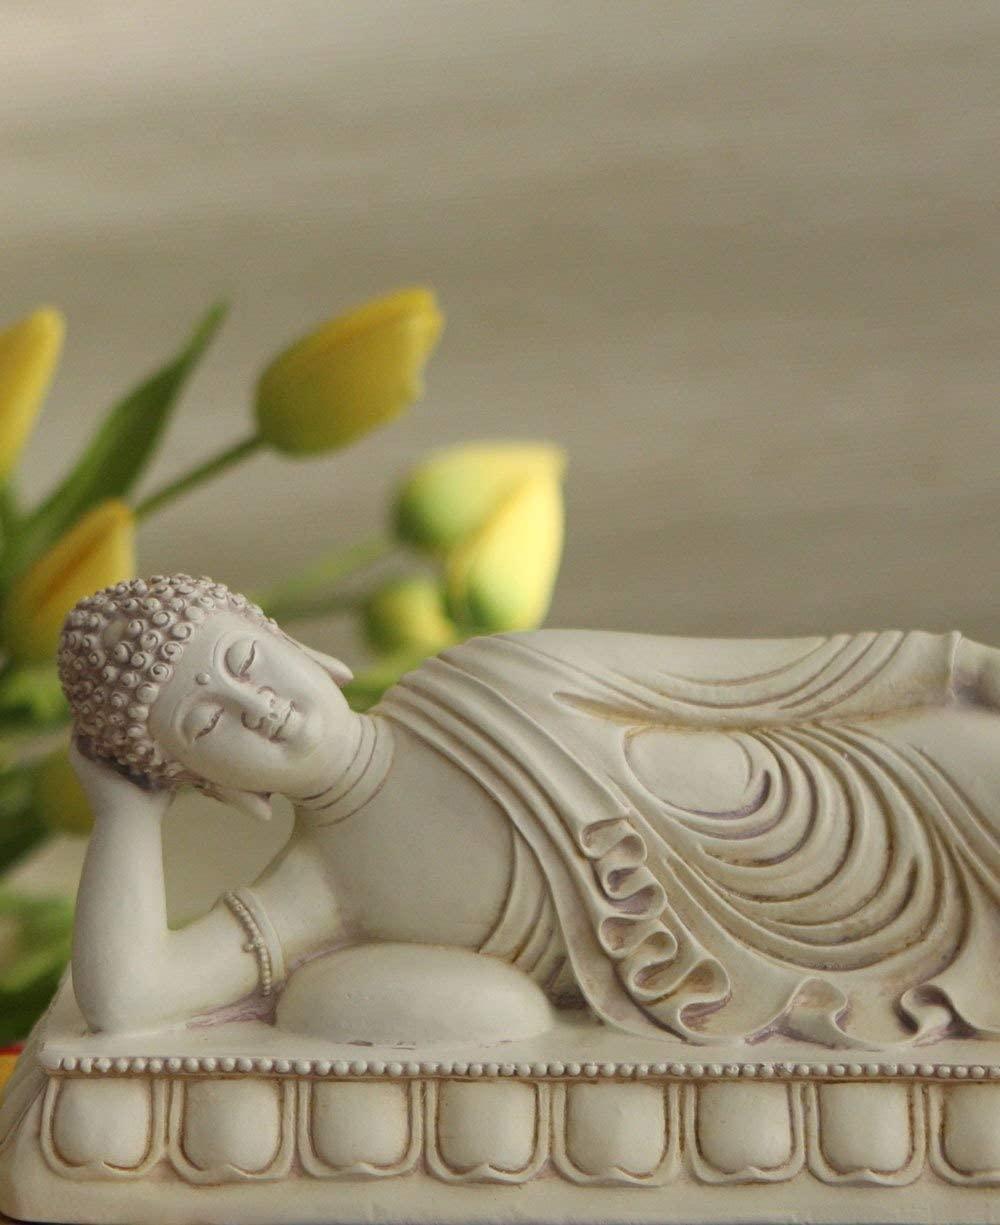 reclining-buddha-statue-small-sculpture-for-mantle-or-shelf-unique-spiritual-gift-idea-buddhist-decoration-ideas